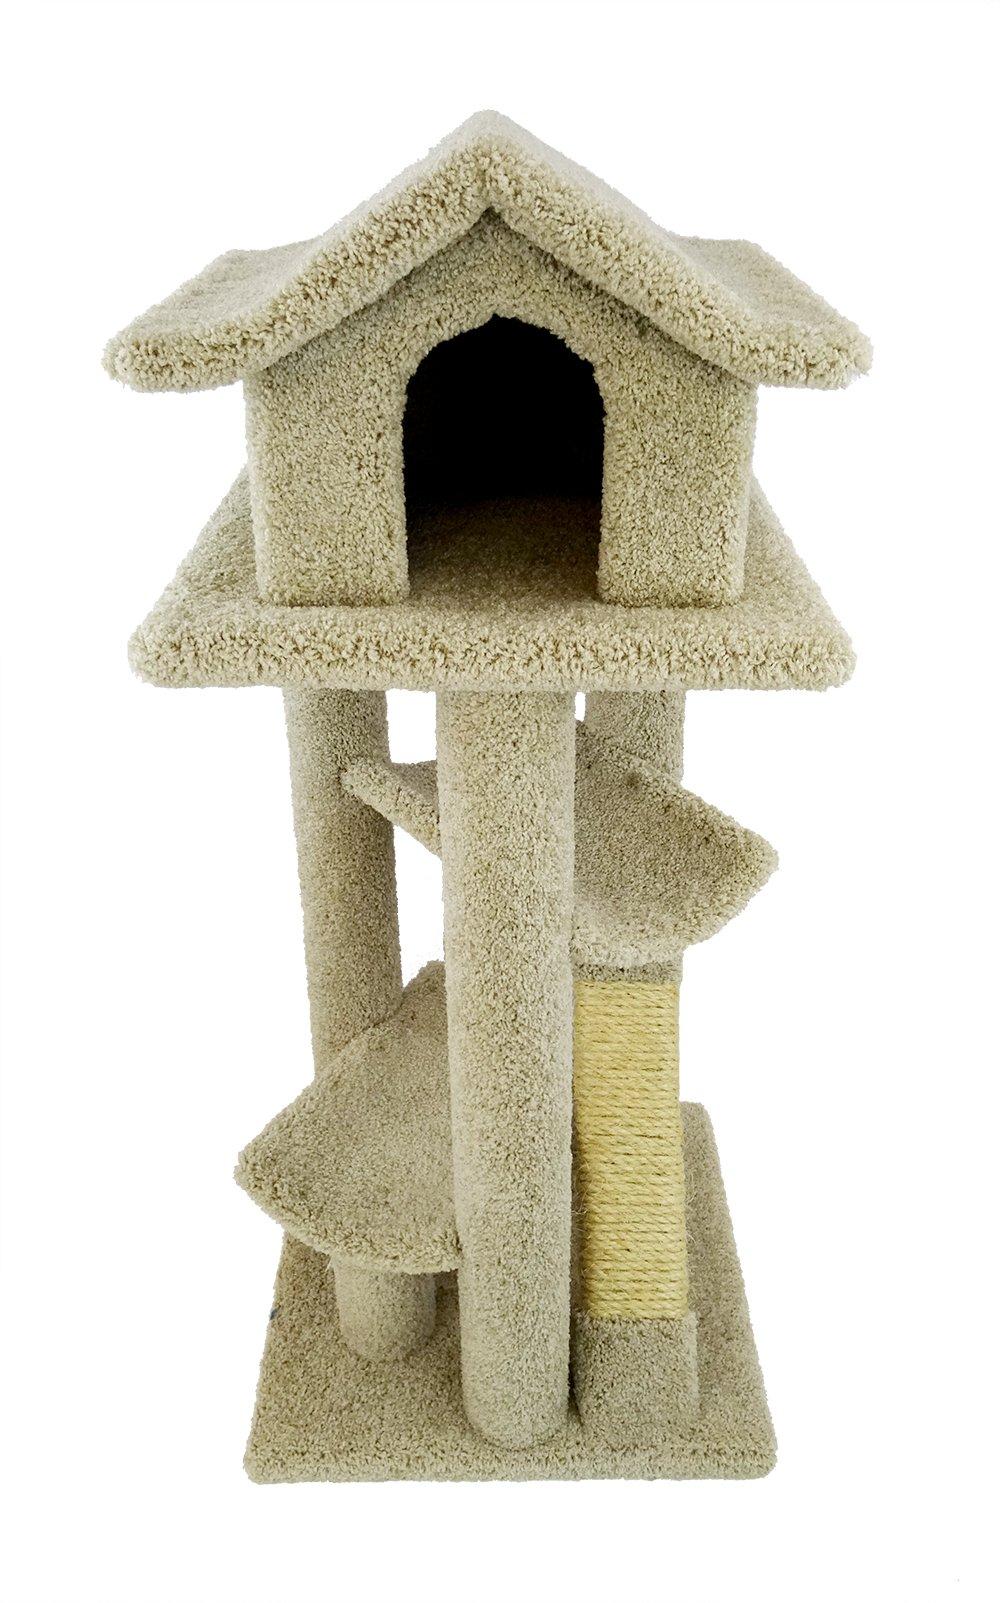 New Cat Condos Premier Large Cat Pagodas Tree, Beige